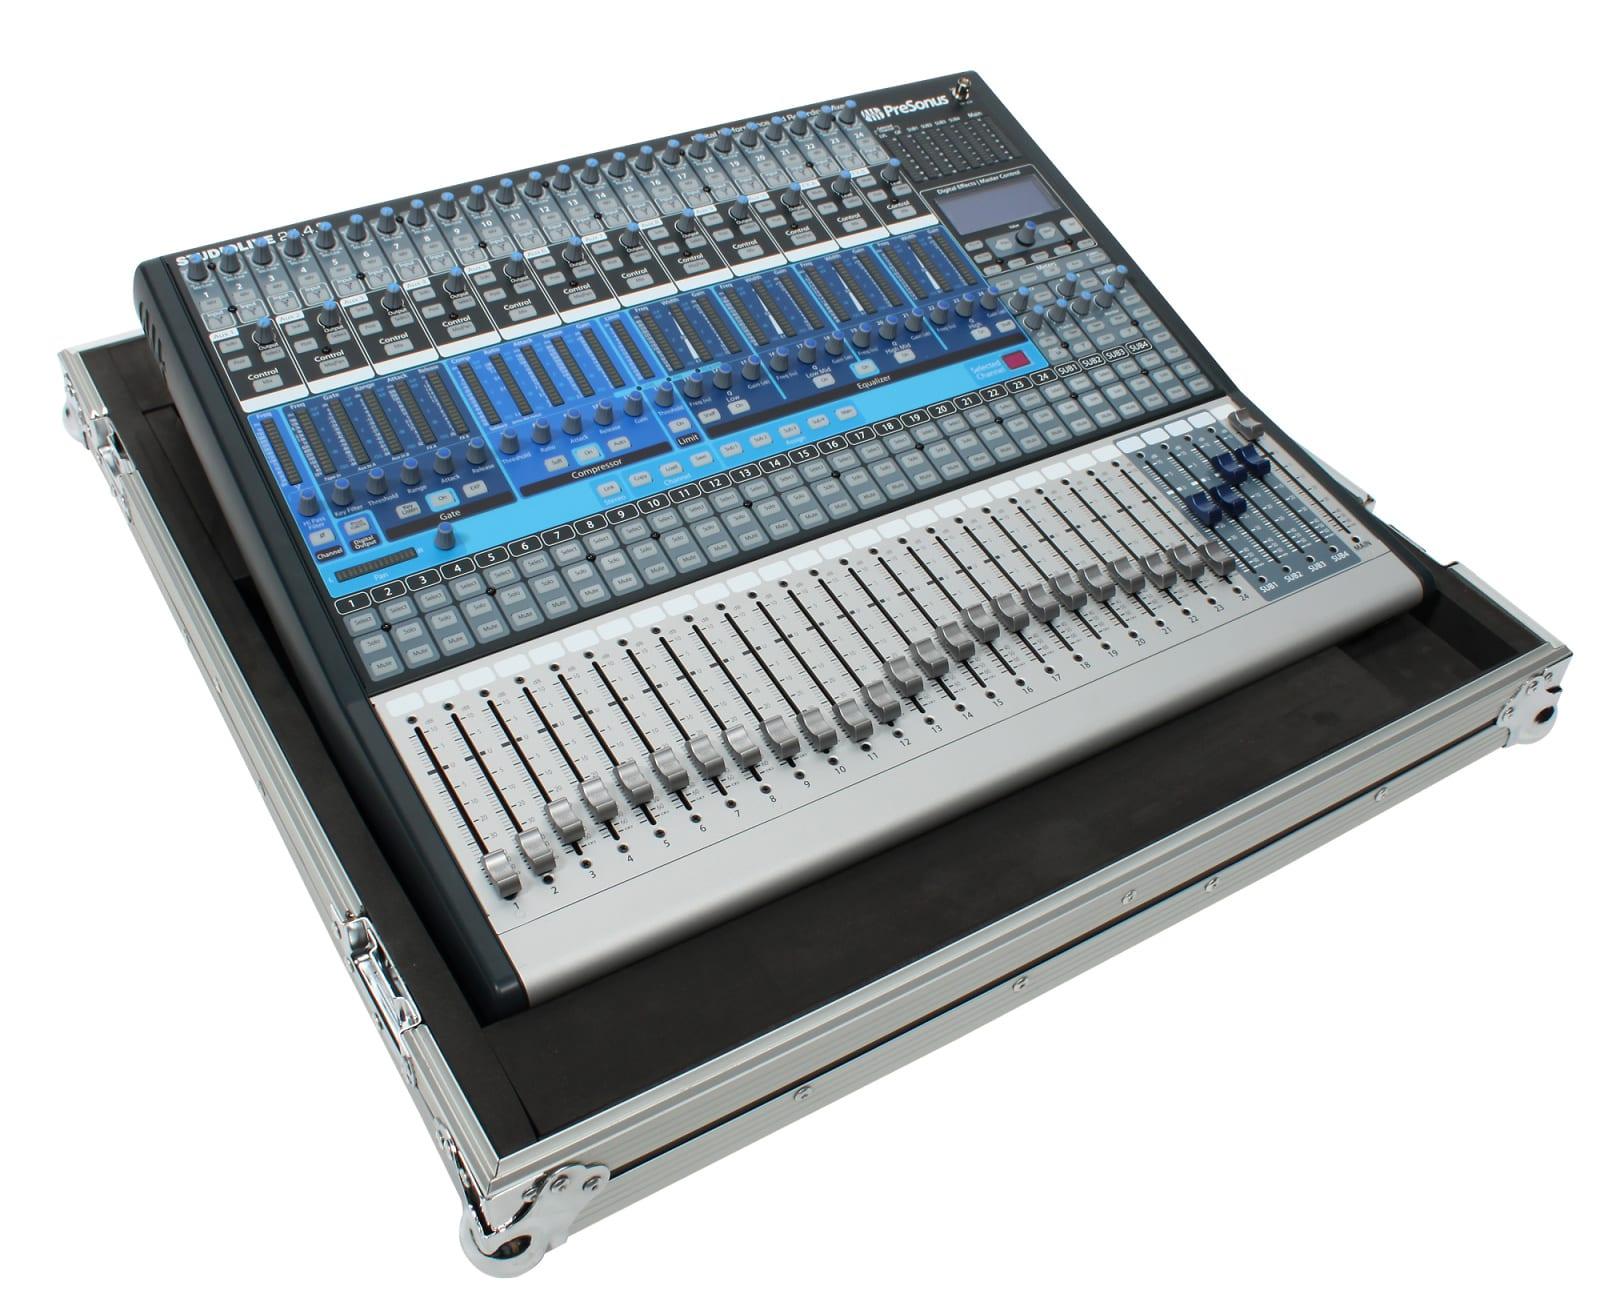 OSP PRE-2442-V2-ATA ATA Case for PreSonus Studio Live 2442 v2